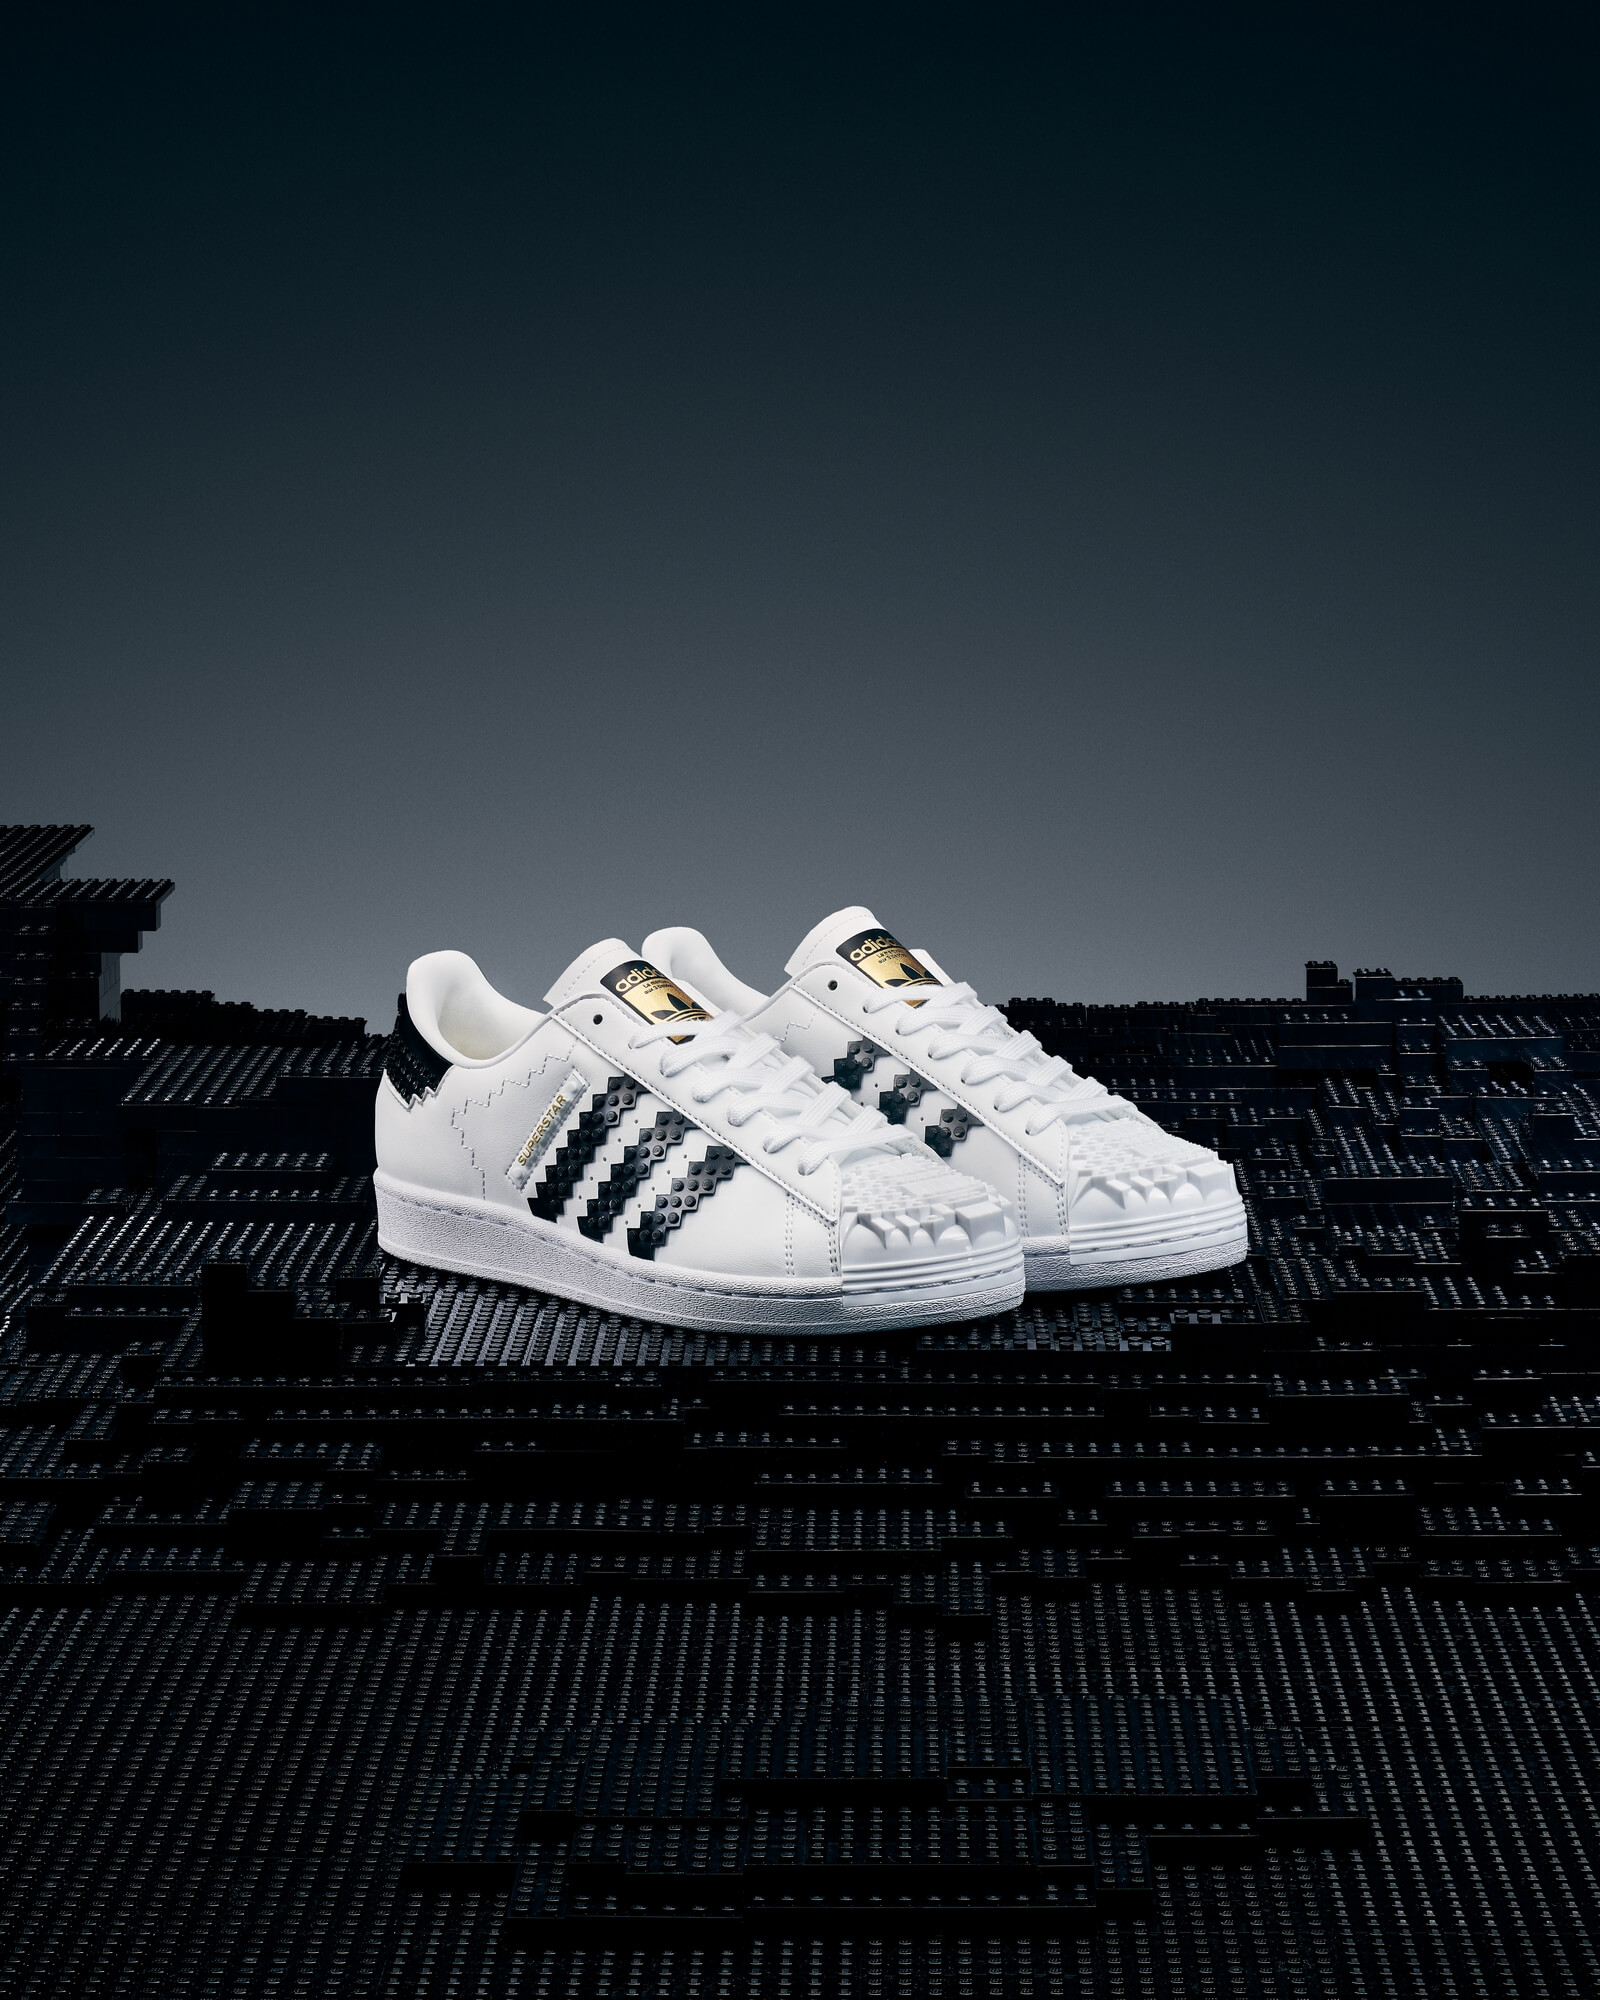 adidas Originals x LEGOSuperstar - The wearable sneaker version